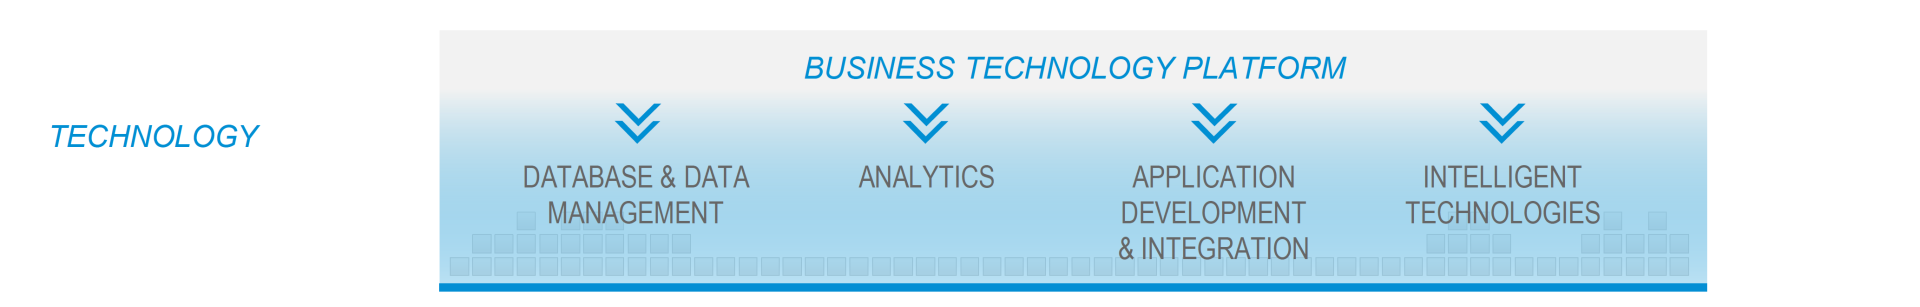 SAP Business Technology Platform | Intelligent Suite | RISE with SAP